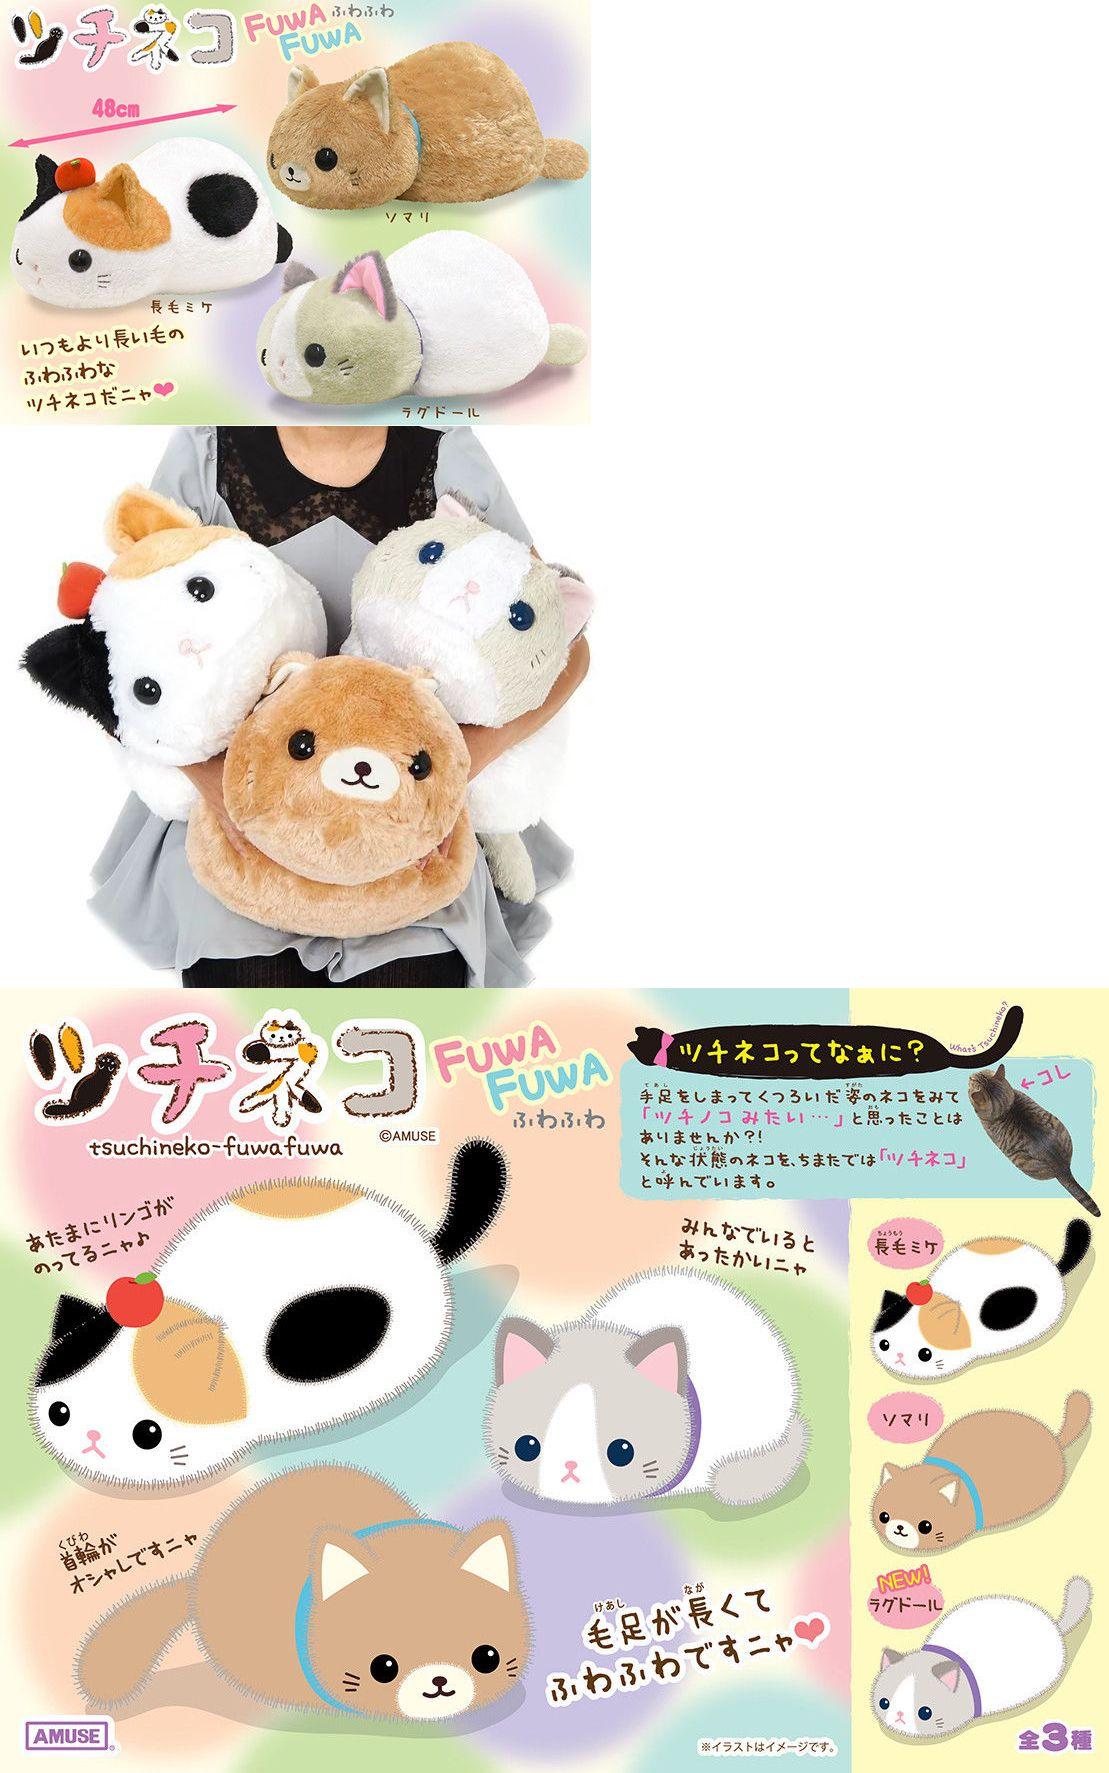 Genuine Japan Amuse Tsuchineko Fuwa Fuwa Cat Big Plush Stuffed Cushion Kawaii Us Ebay Big Plush Big Stuffed Animal Giant Stuffed Animals